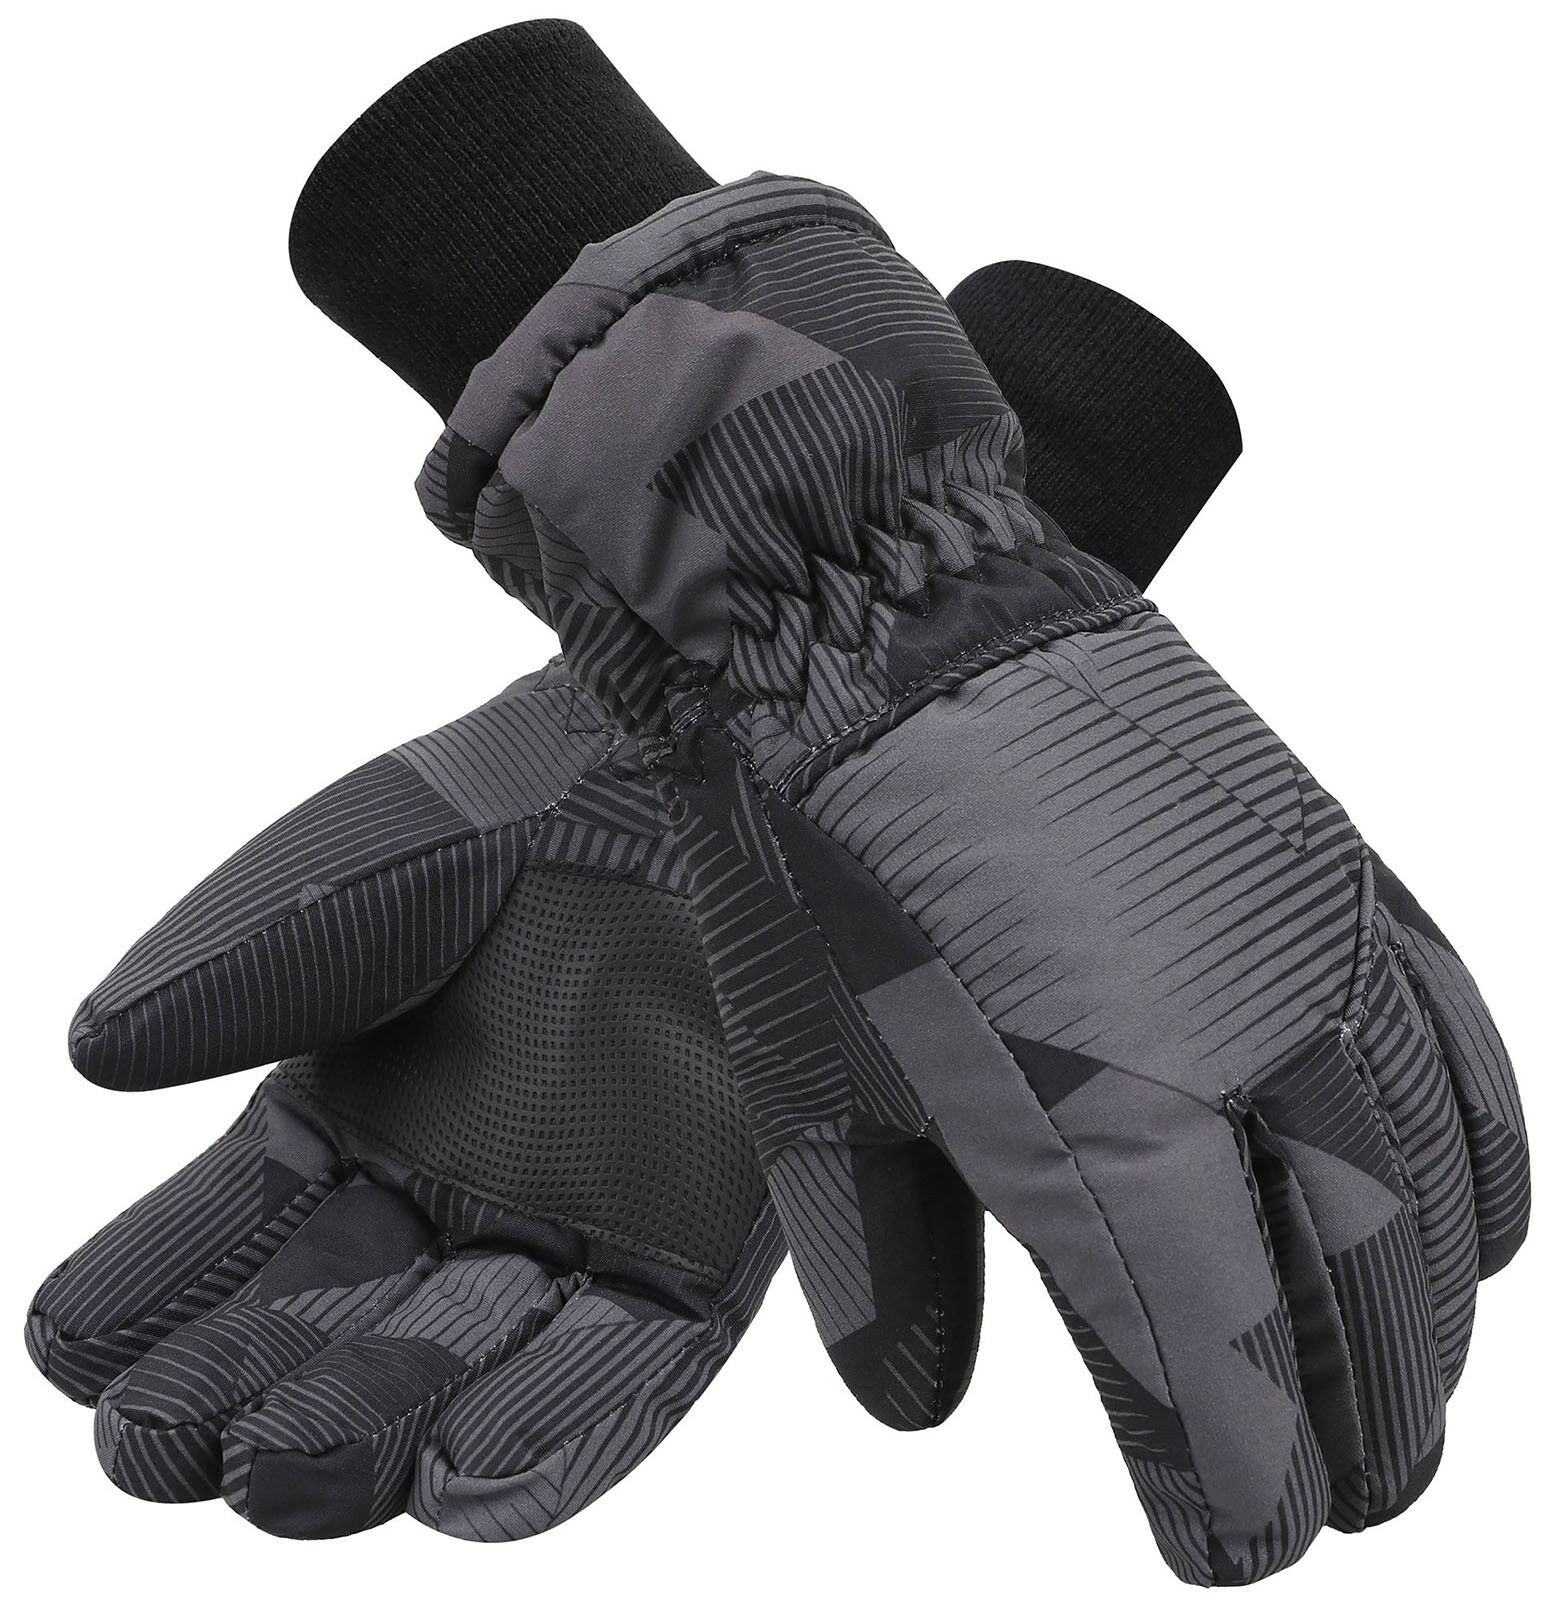 New Boys Kids 3M Thinsulate Waterproof Ski Gloves Winter Spo